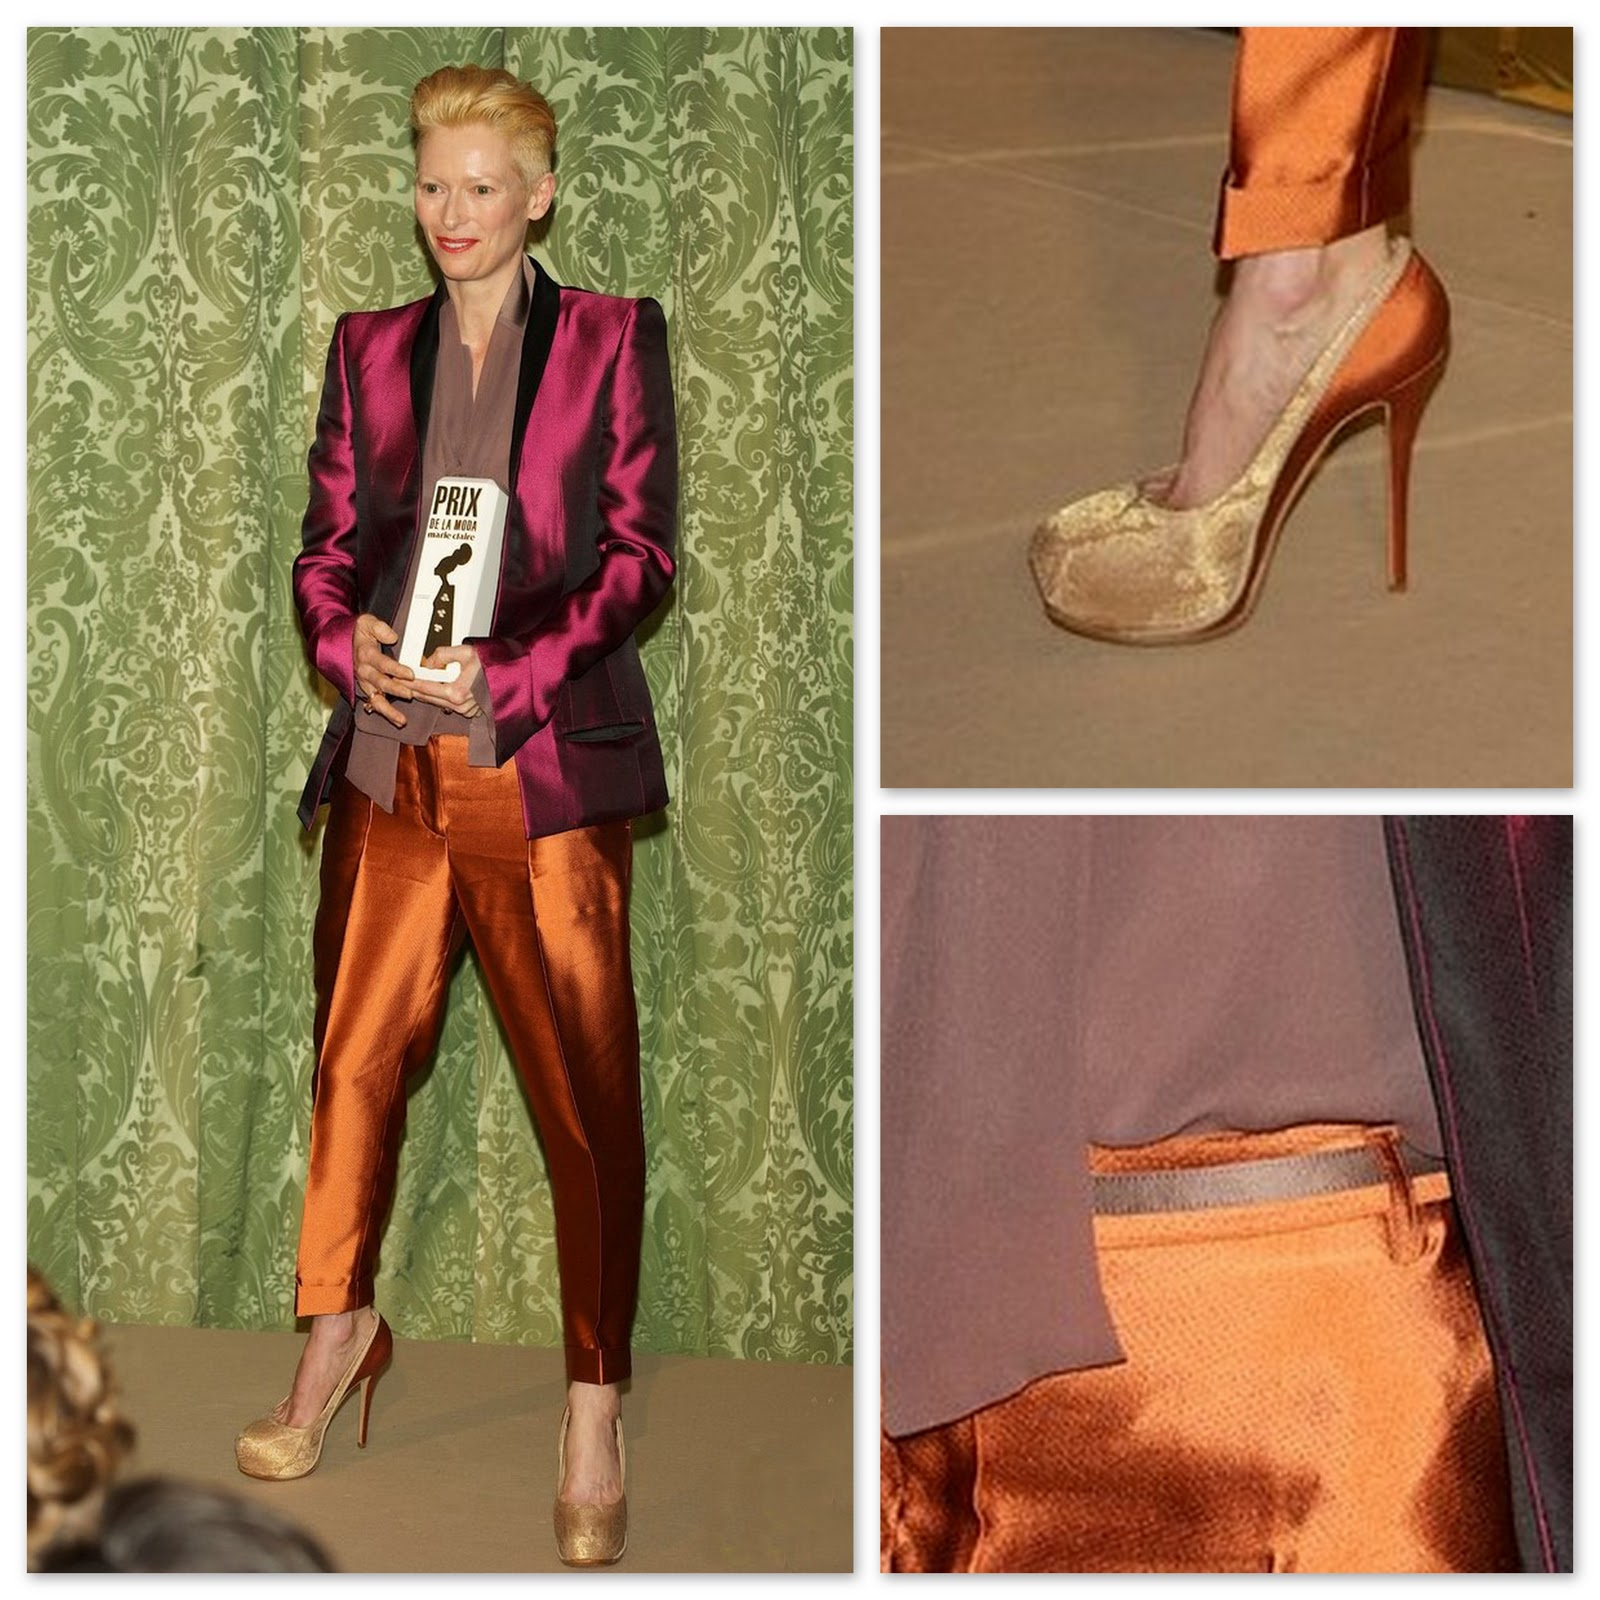 http://3.bp.blogspot.com/-JoLAr09IAn4/TsiGf1_a44I/AAAAAAAAE38/VsWwzMEfFZk/s1600/best+dressed.jpg